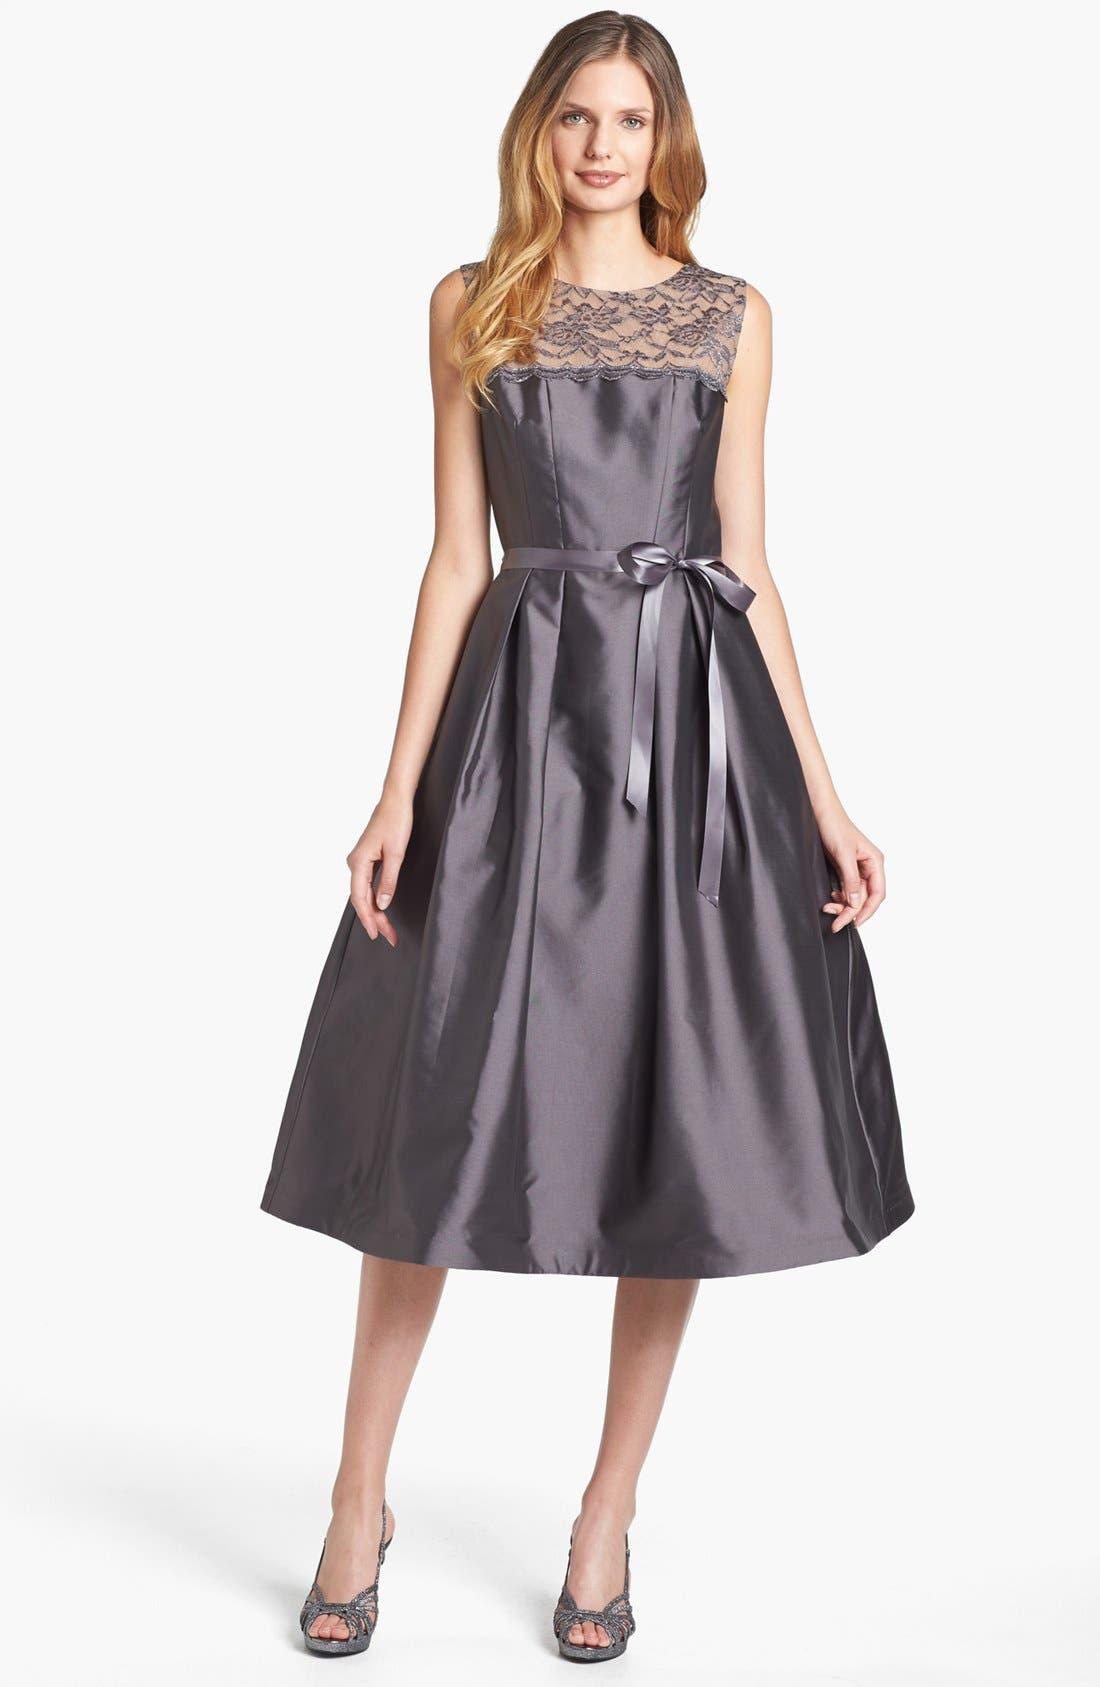 Alternate Image 1 Selected - Alex Evenings Illusion Yoke Satin Fit & Flare Dress